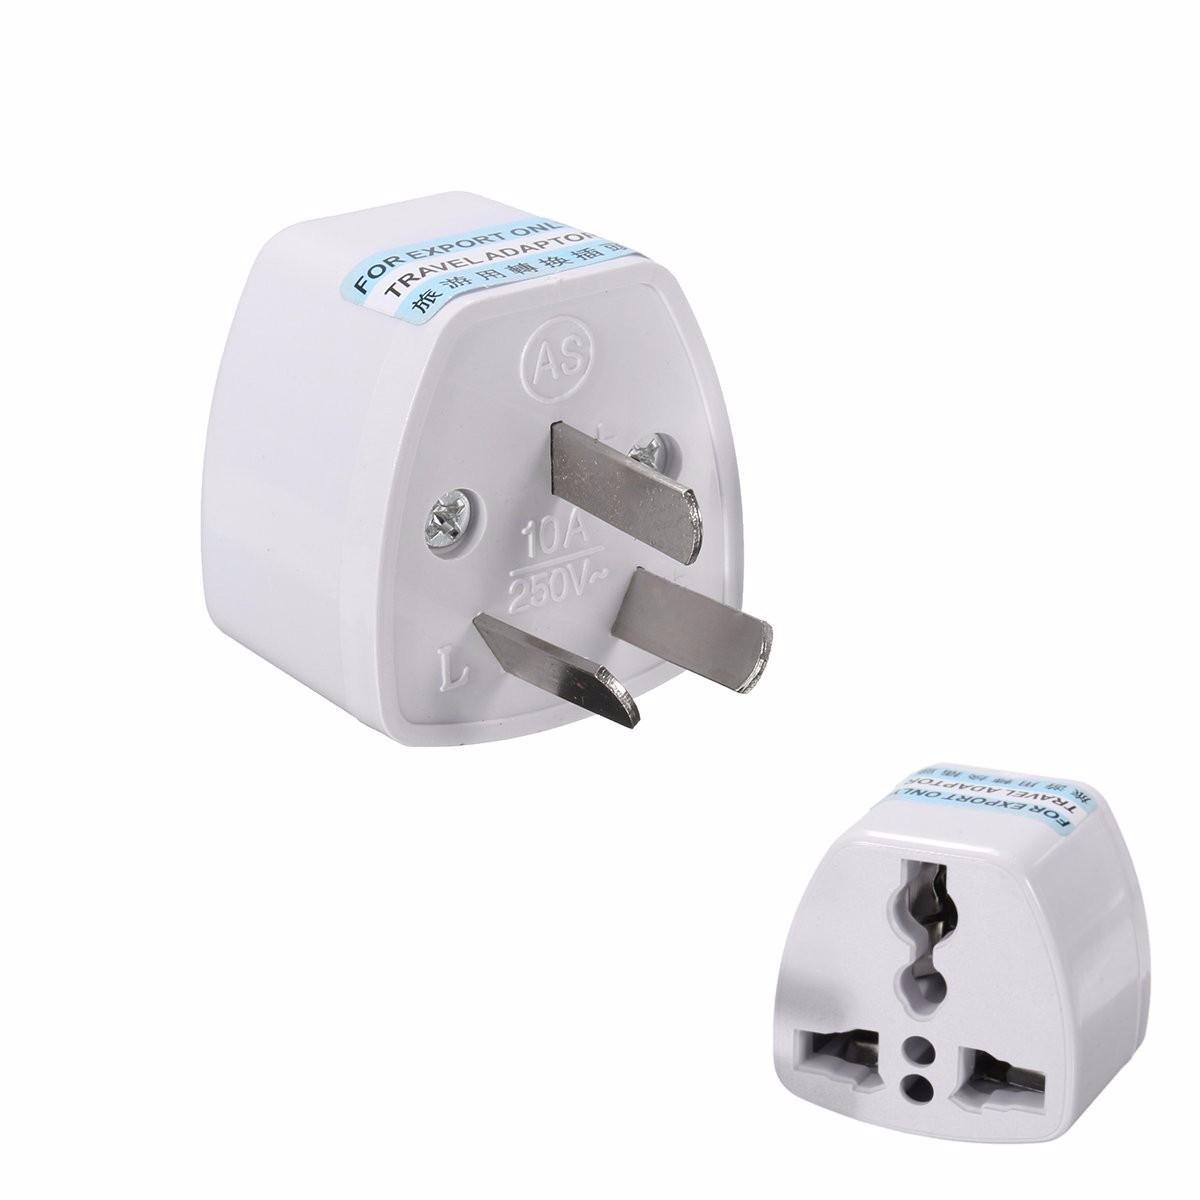 5pcs Universal Power Plug Travel Adapter 3 Pin Converter 250V 10A US UK EU to AU AC